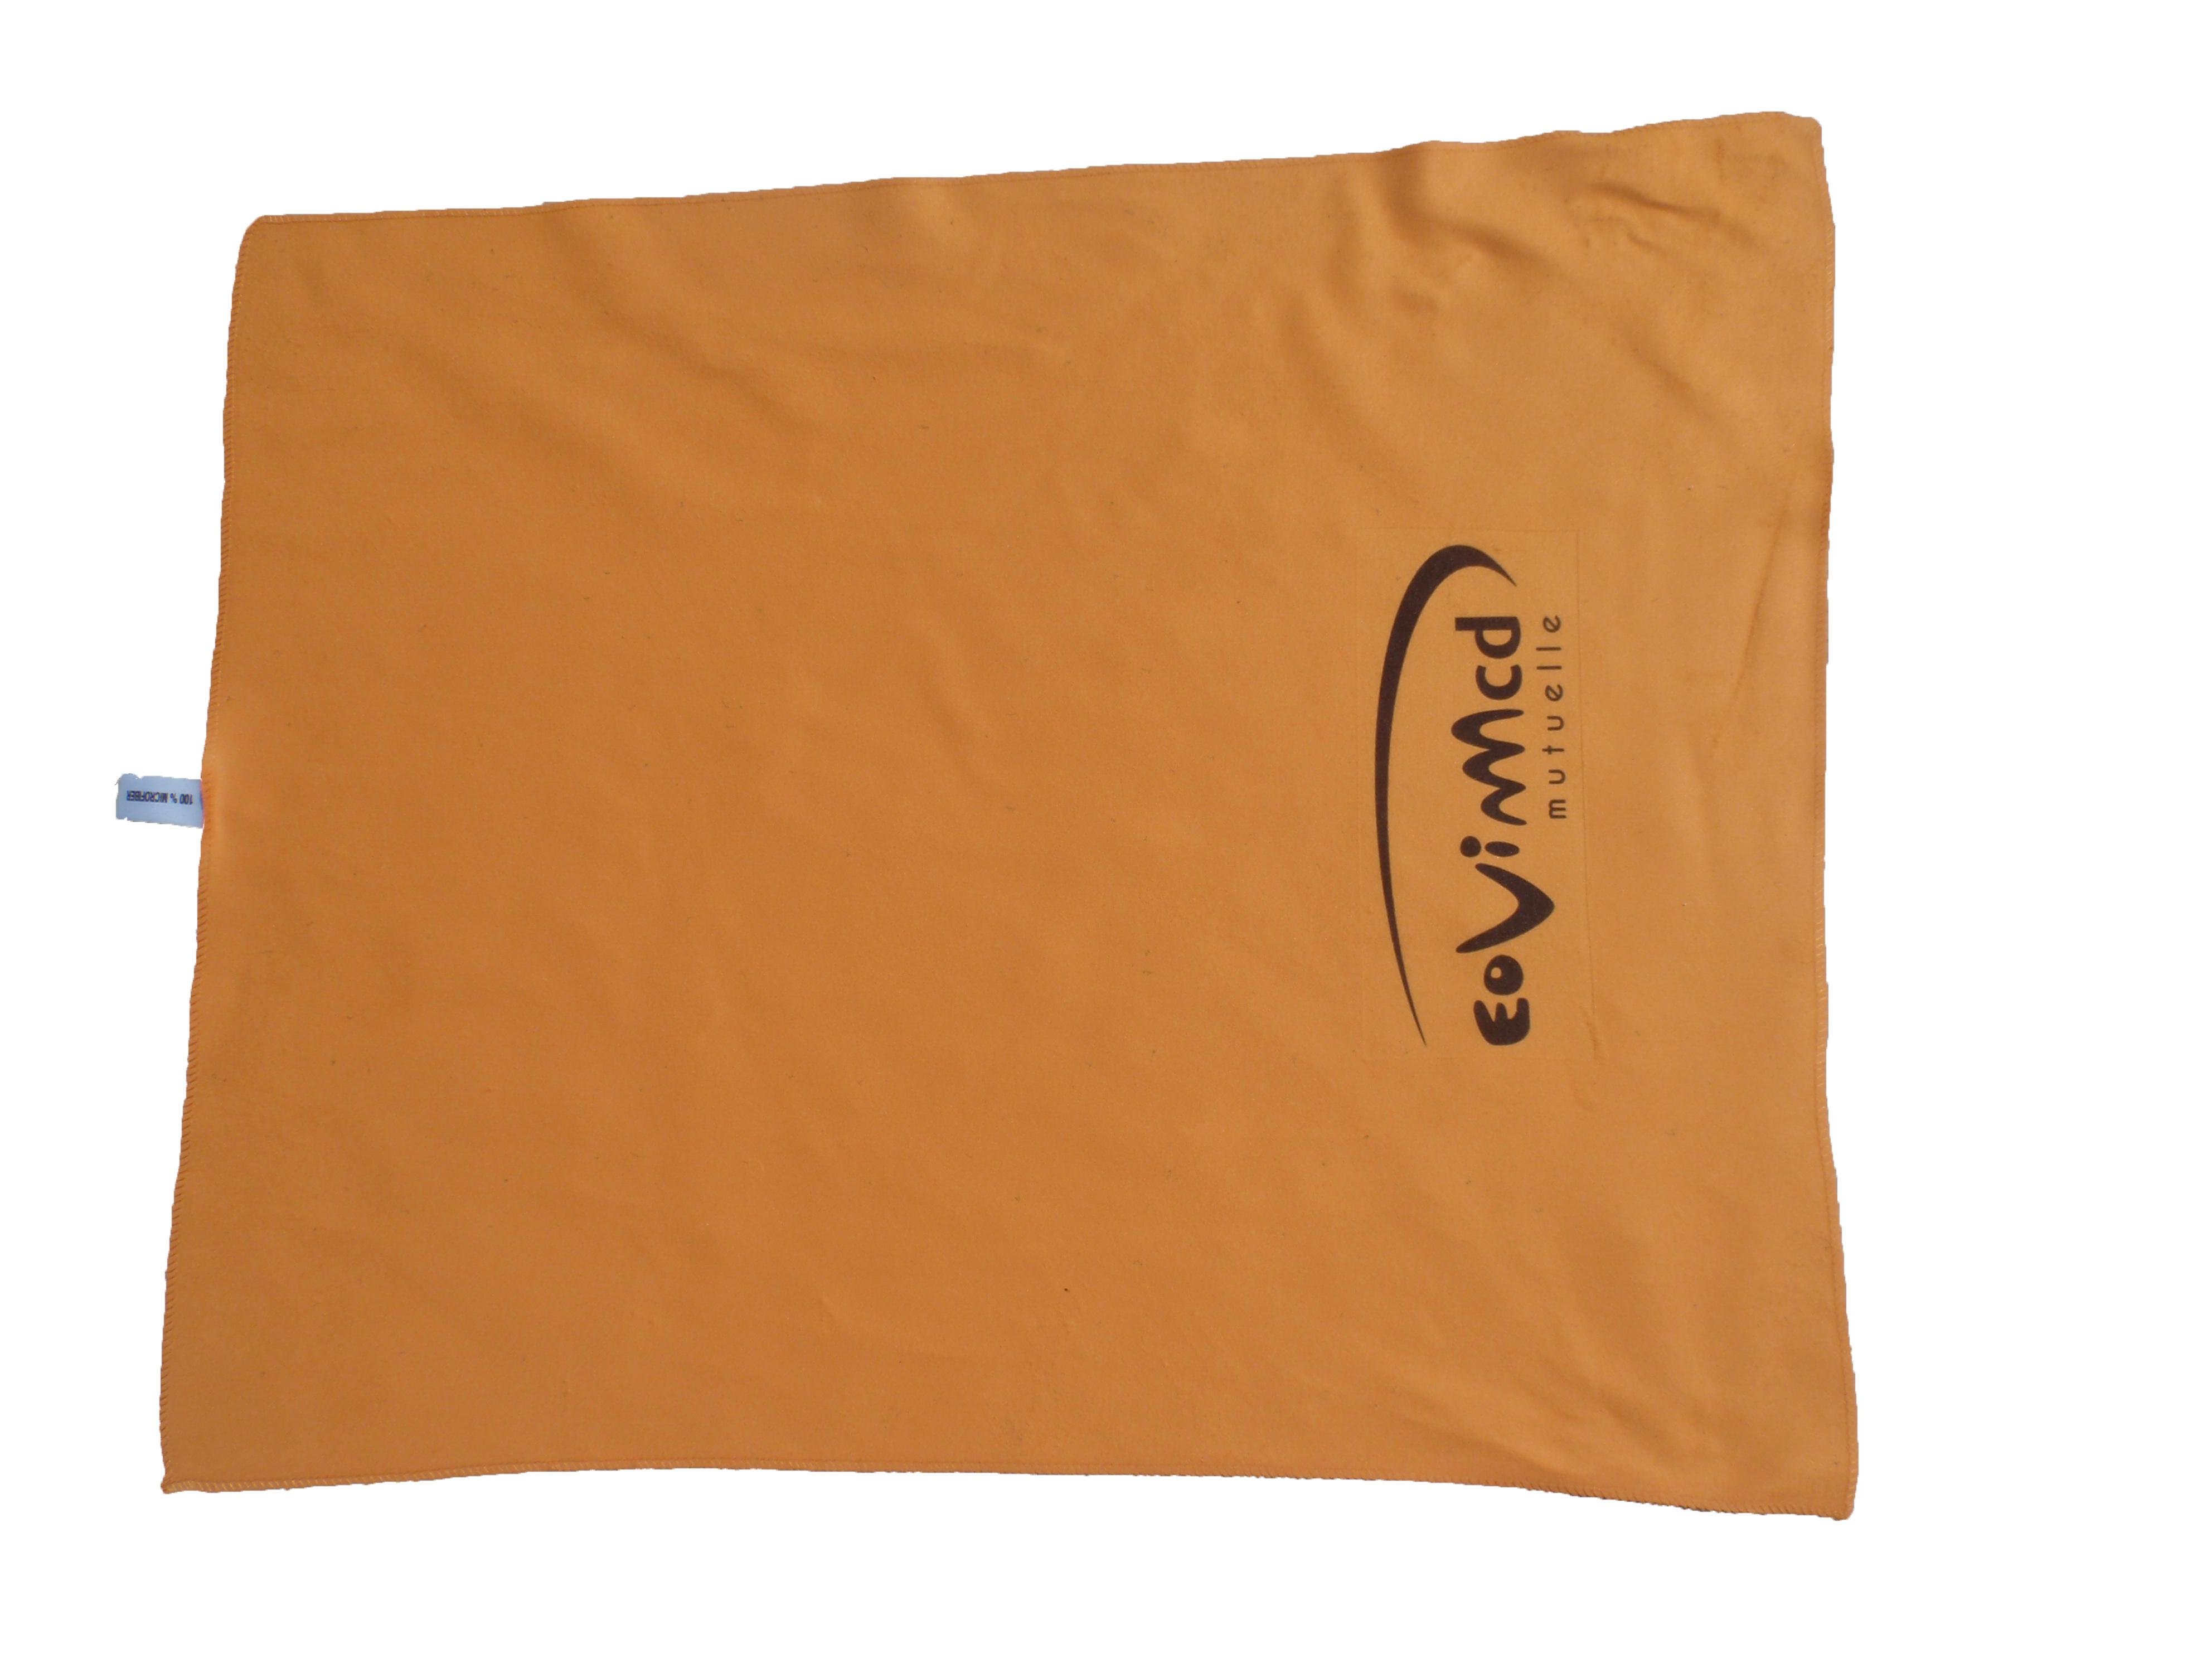 Microfiber printed towels